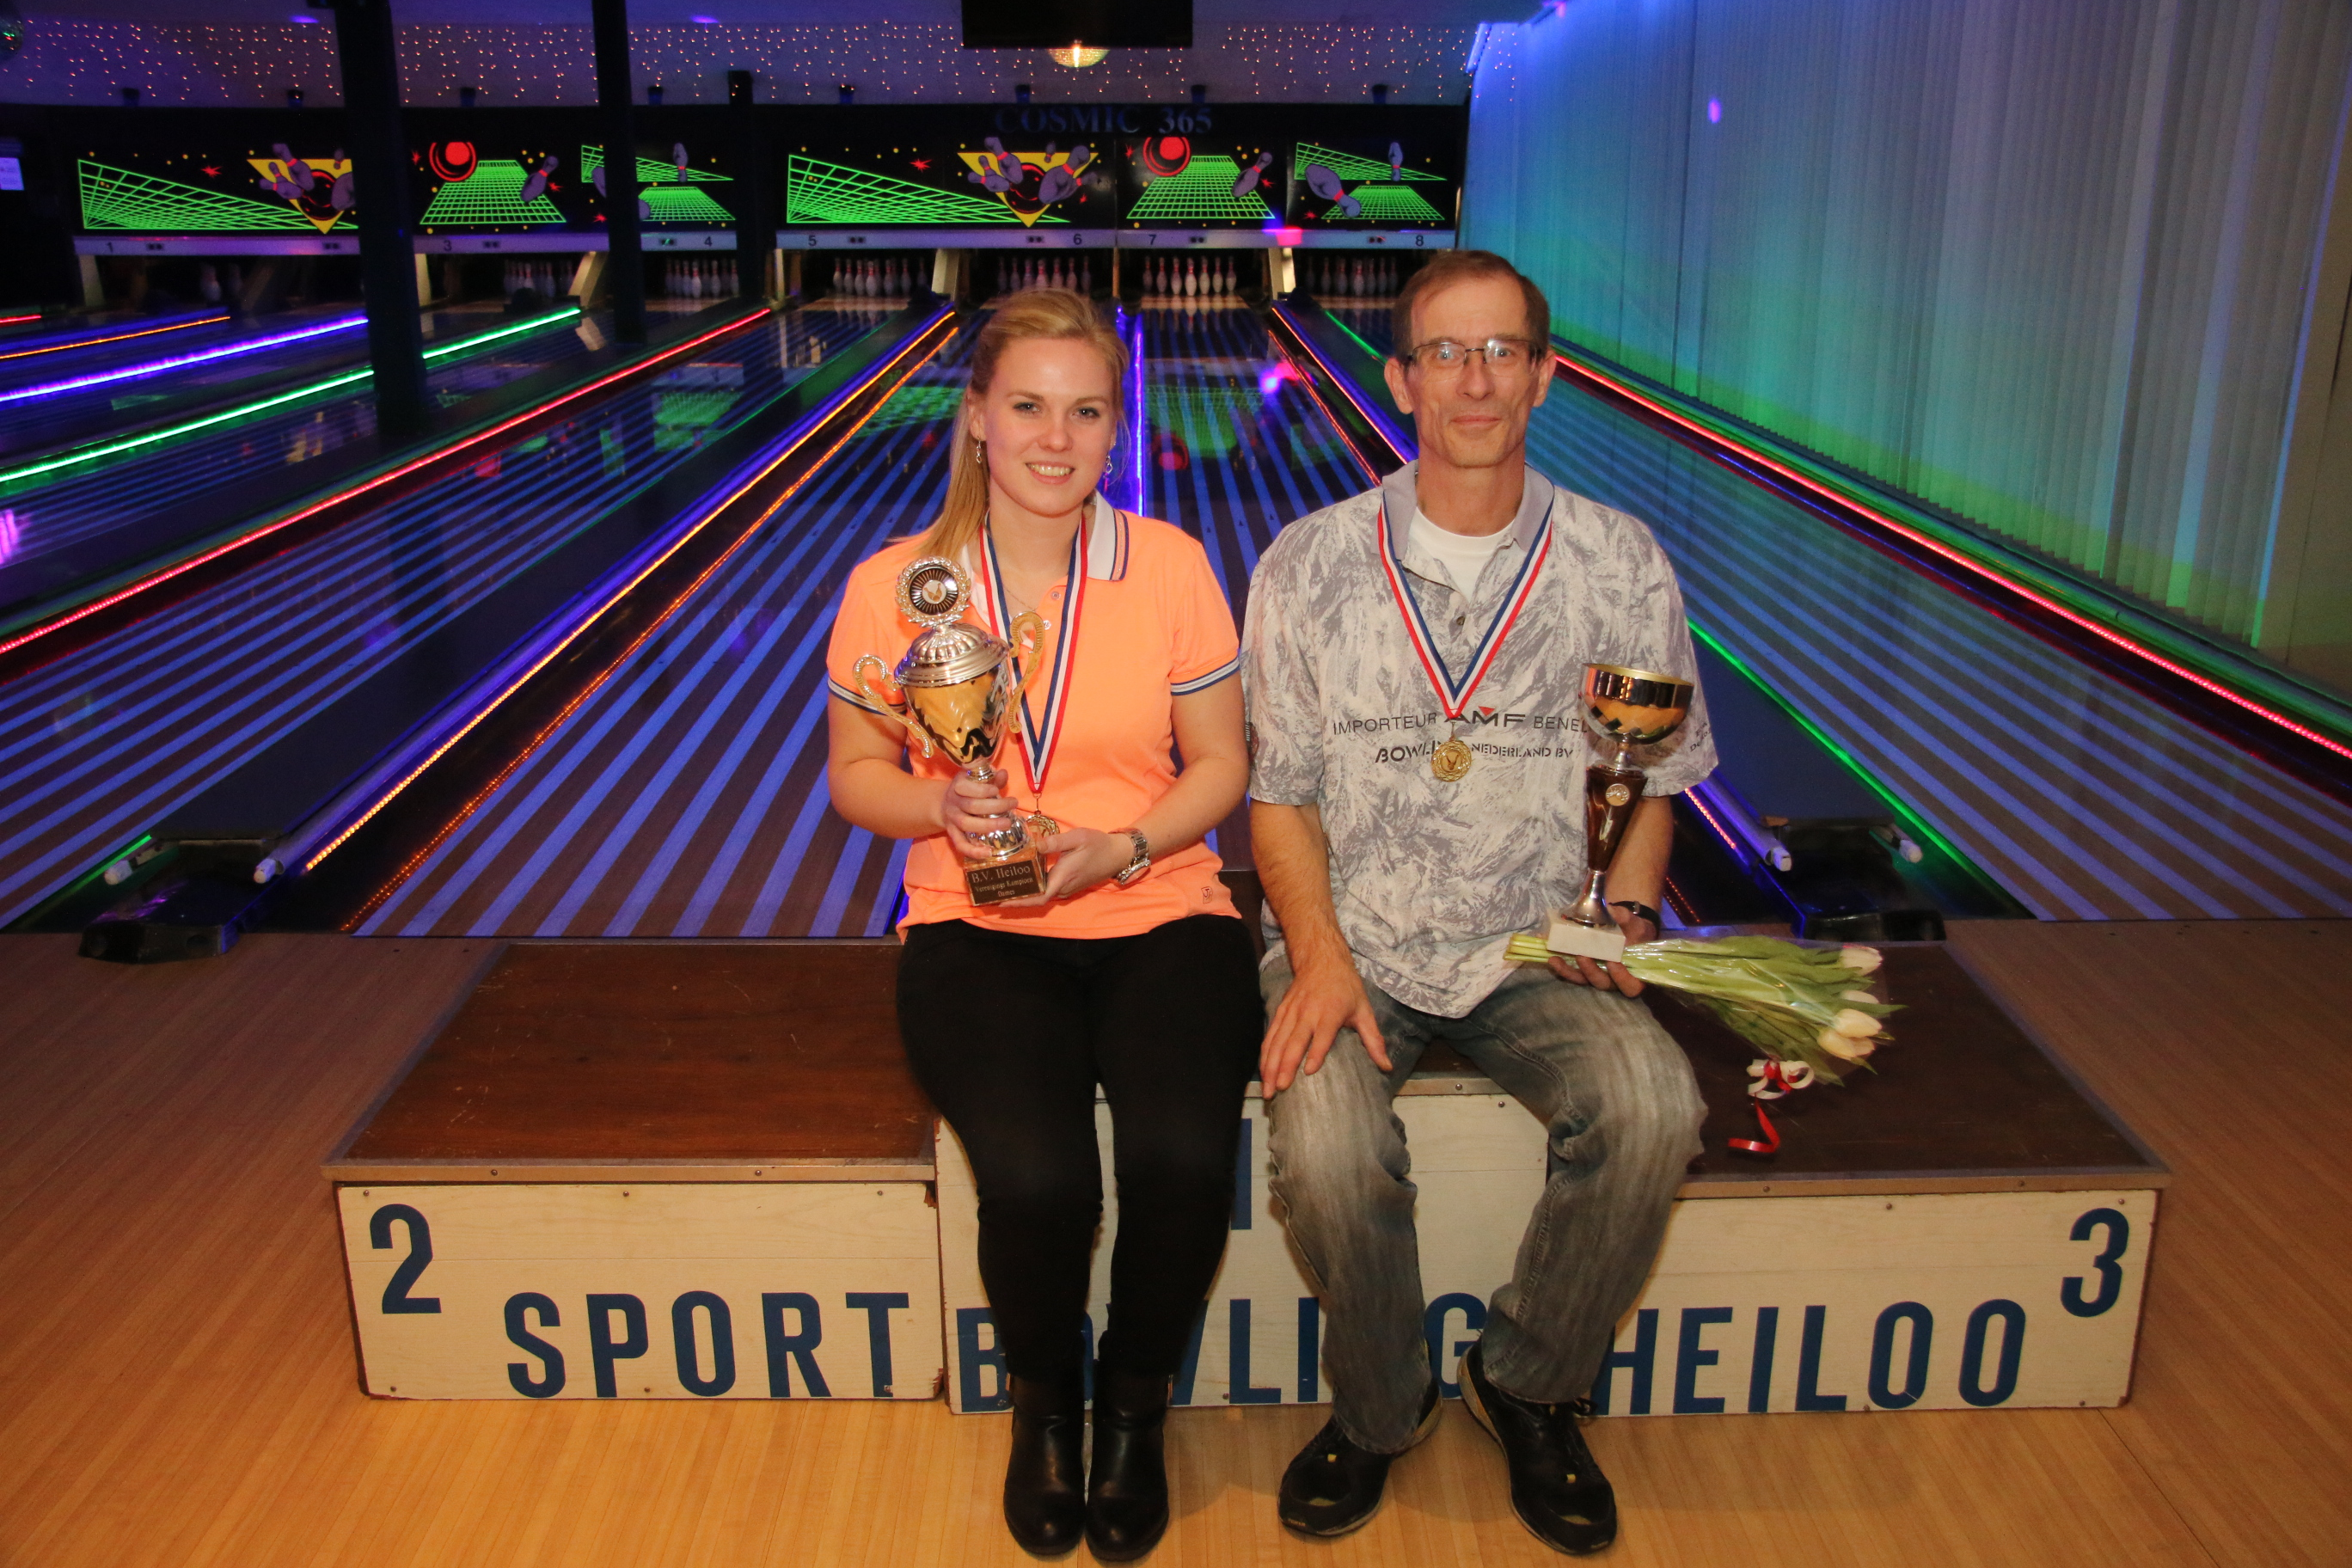 http://www.bowlingverenigingheiloo.nl/fotos_verhalen/foto's/2015_0212-Verenigingskampioenen-2015.jpg